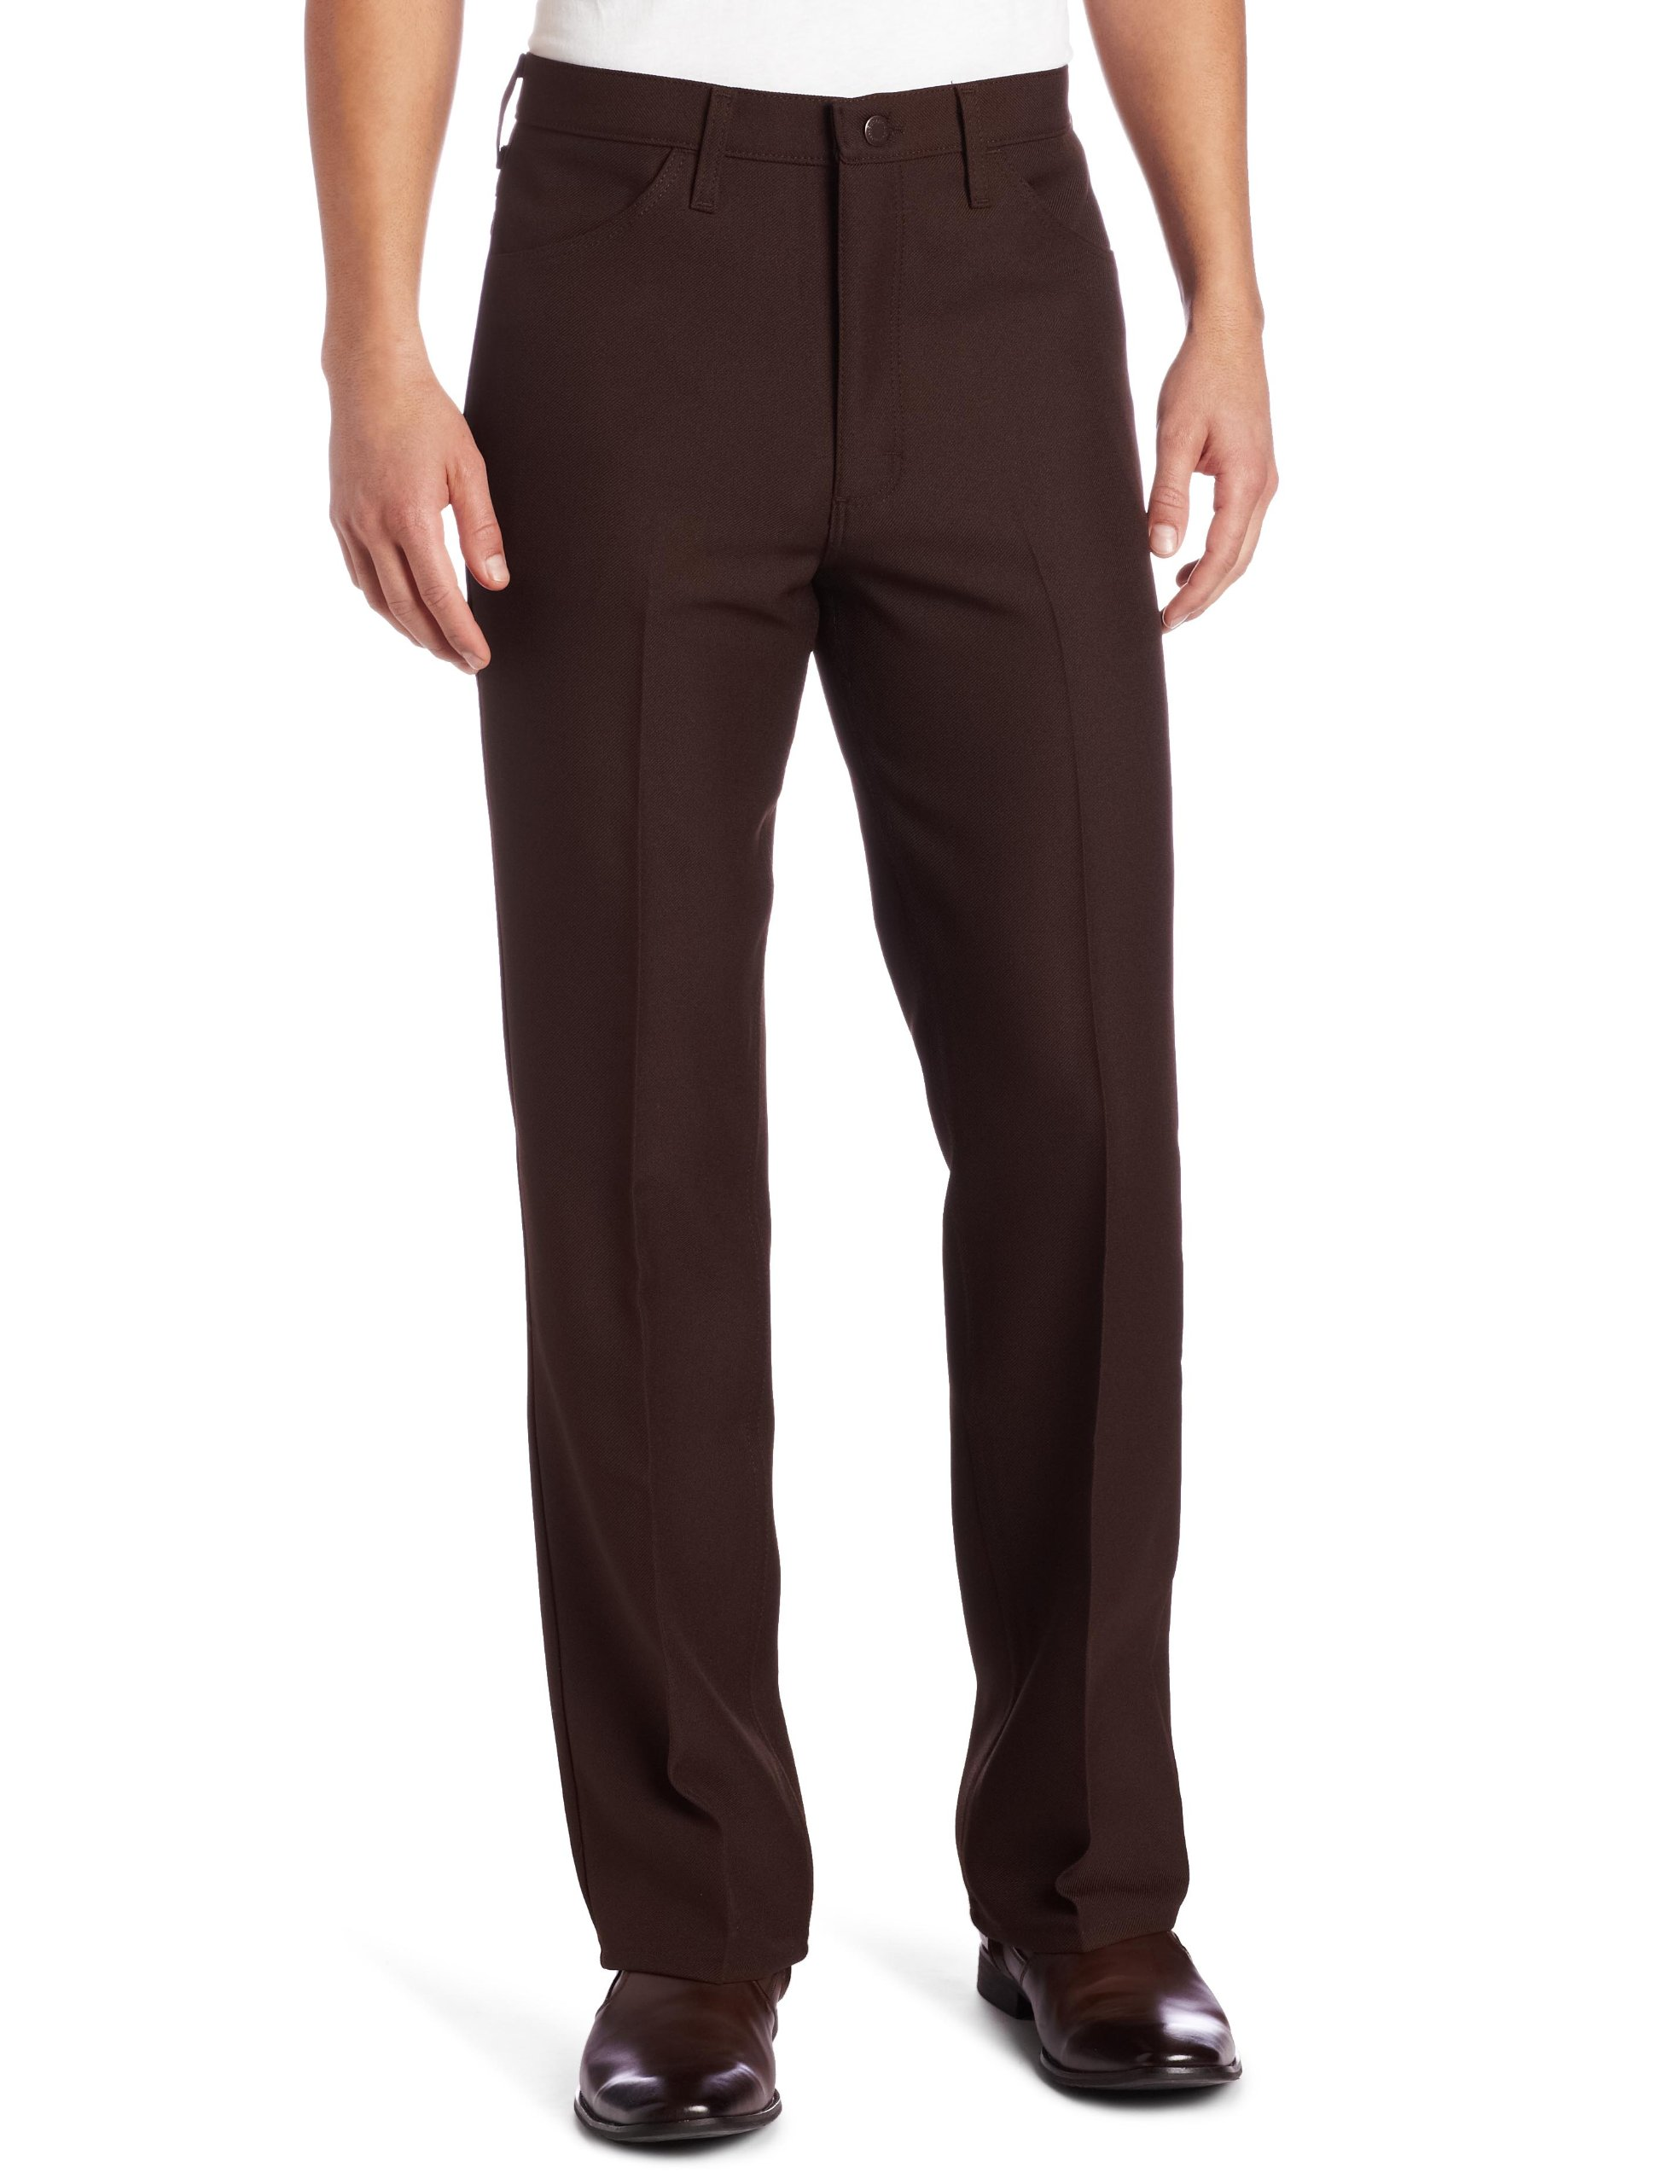 Wrangler Men's Big Wrancher Dress Pant, Brown, 44x32